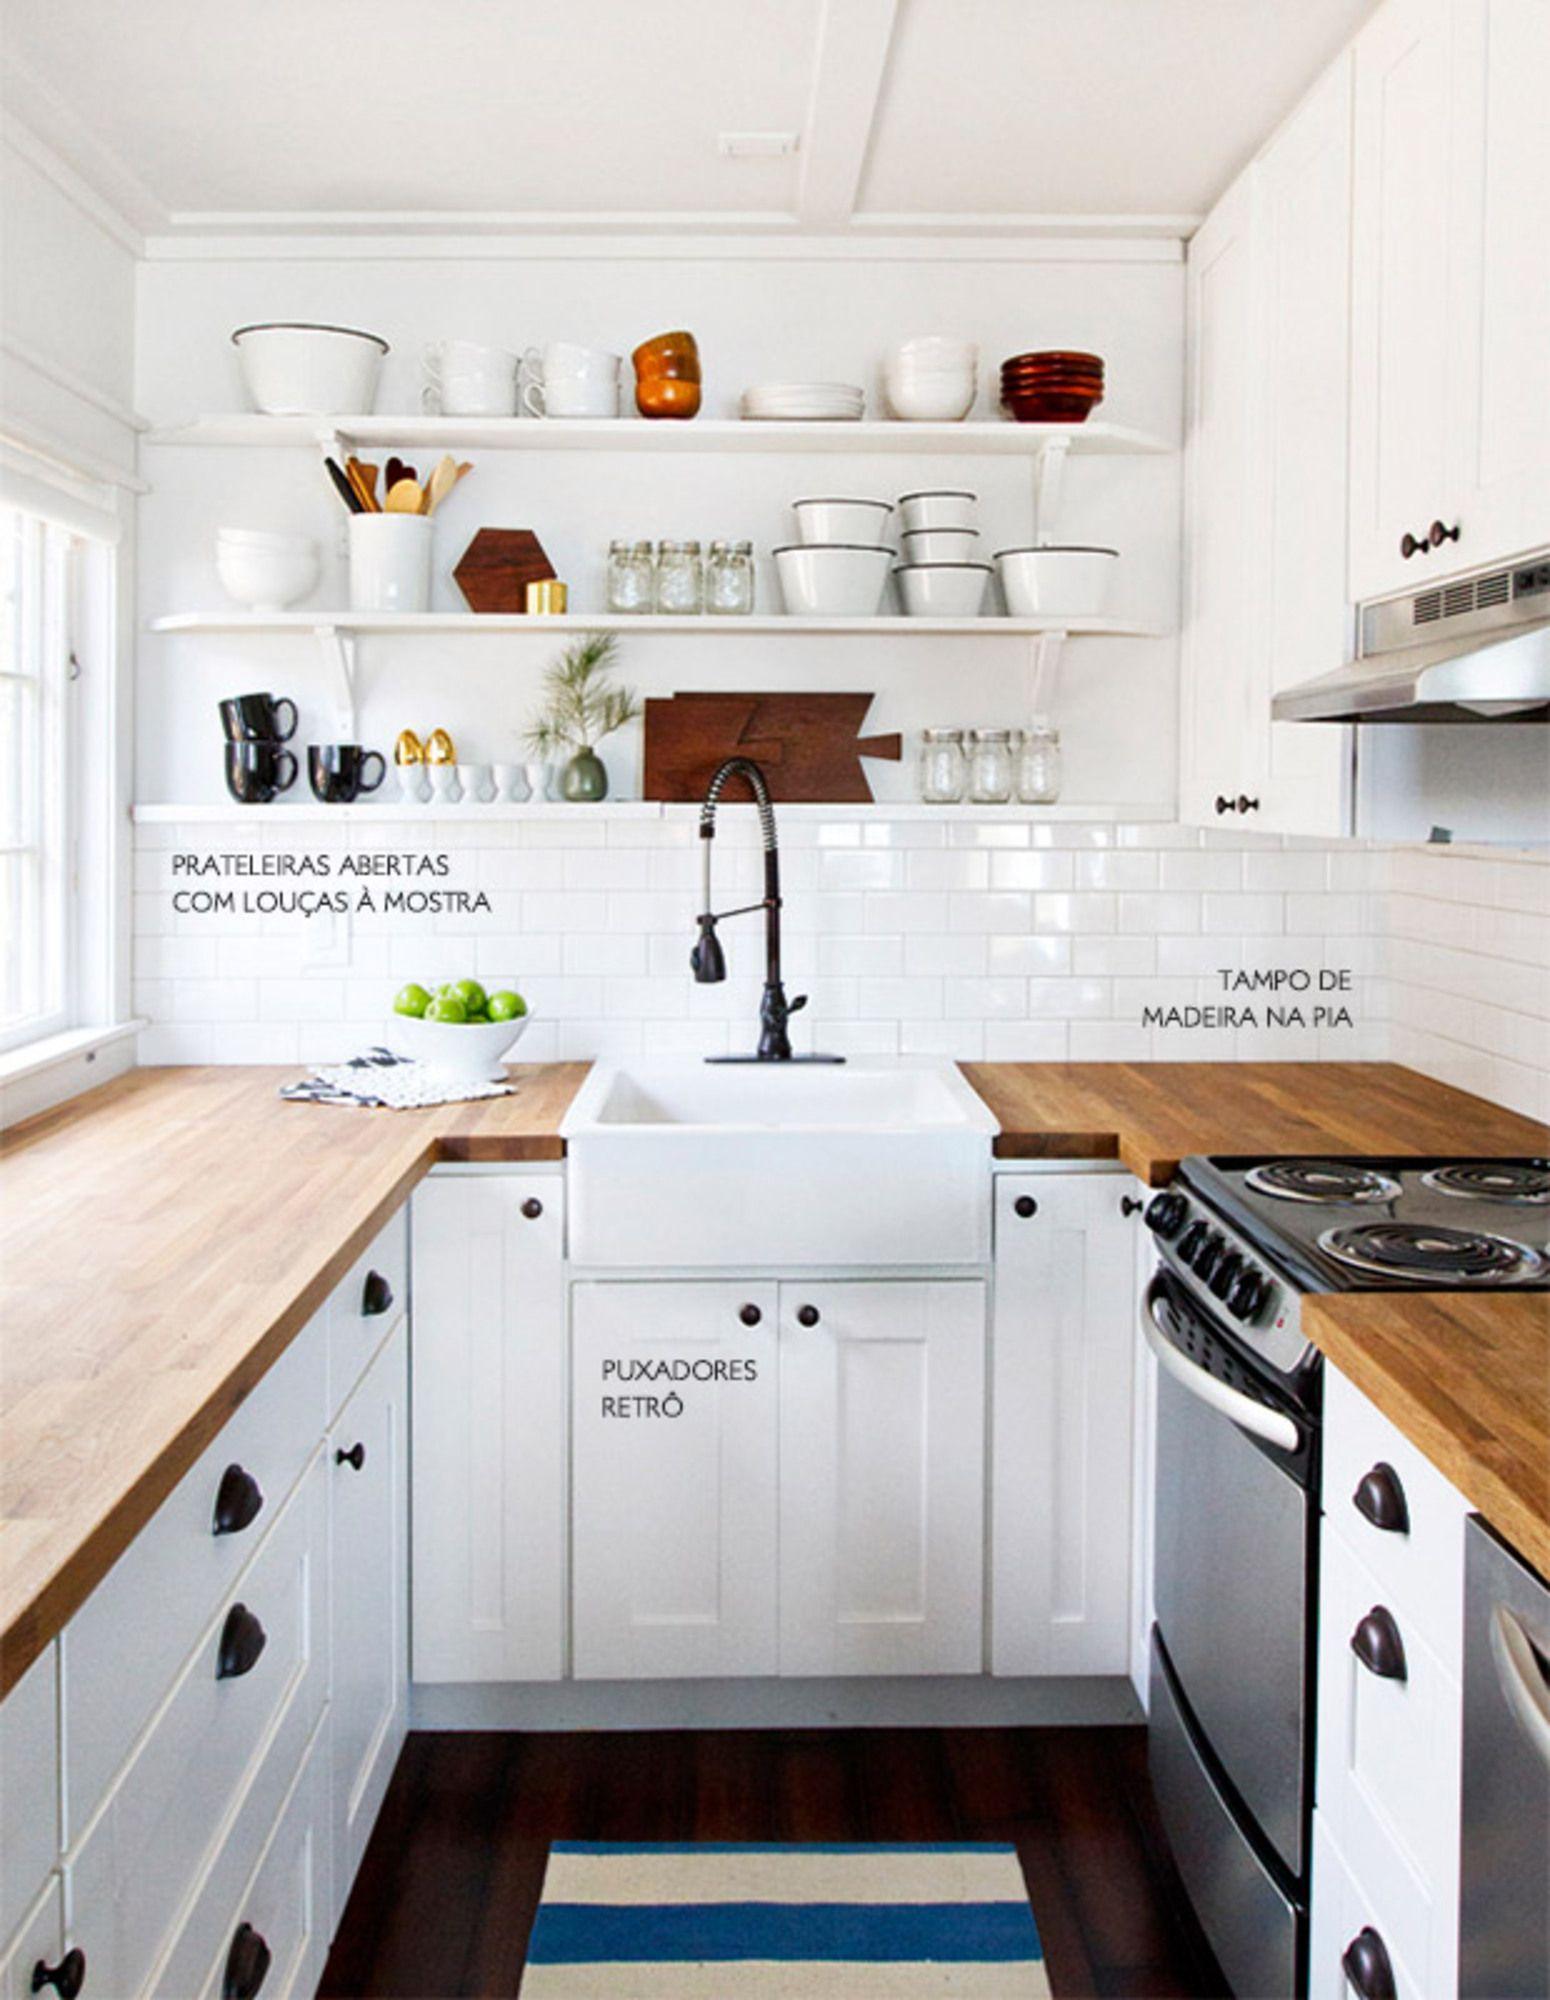 COZINHAS VINTAGE | cozinha vintage retrô | Pinterest | Küche